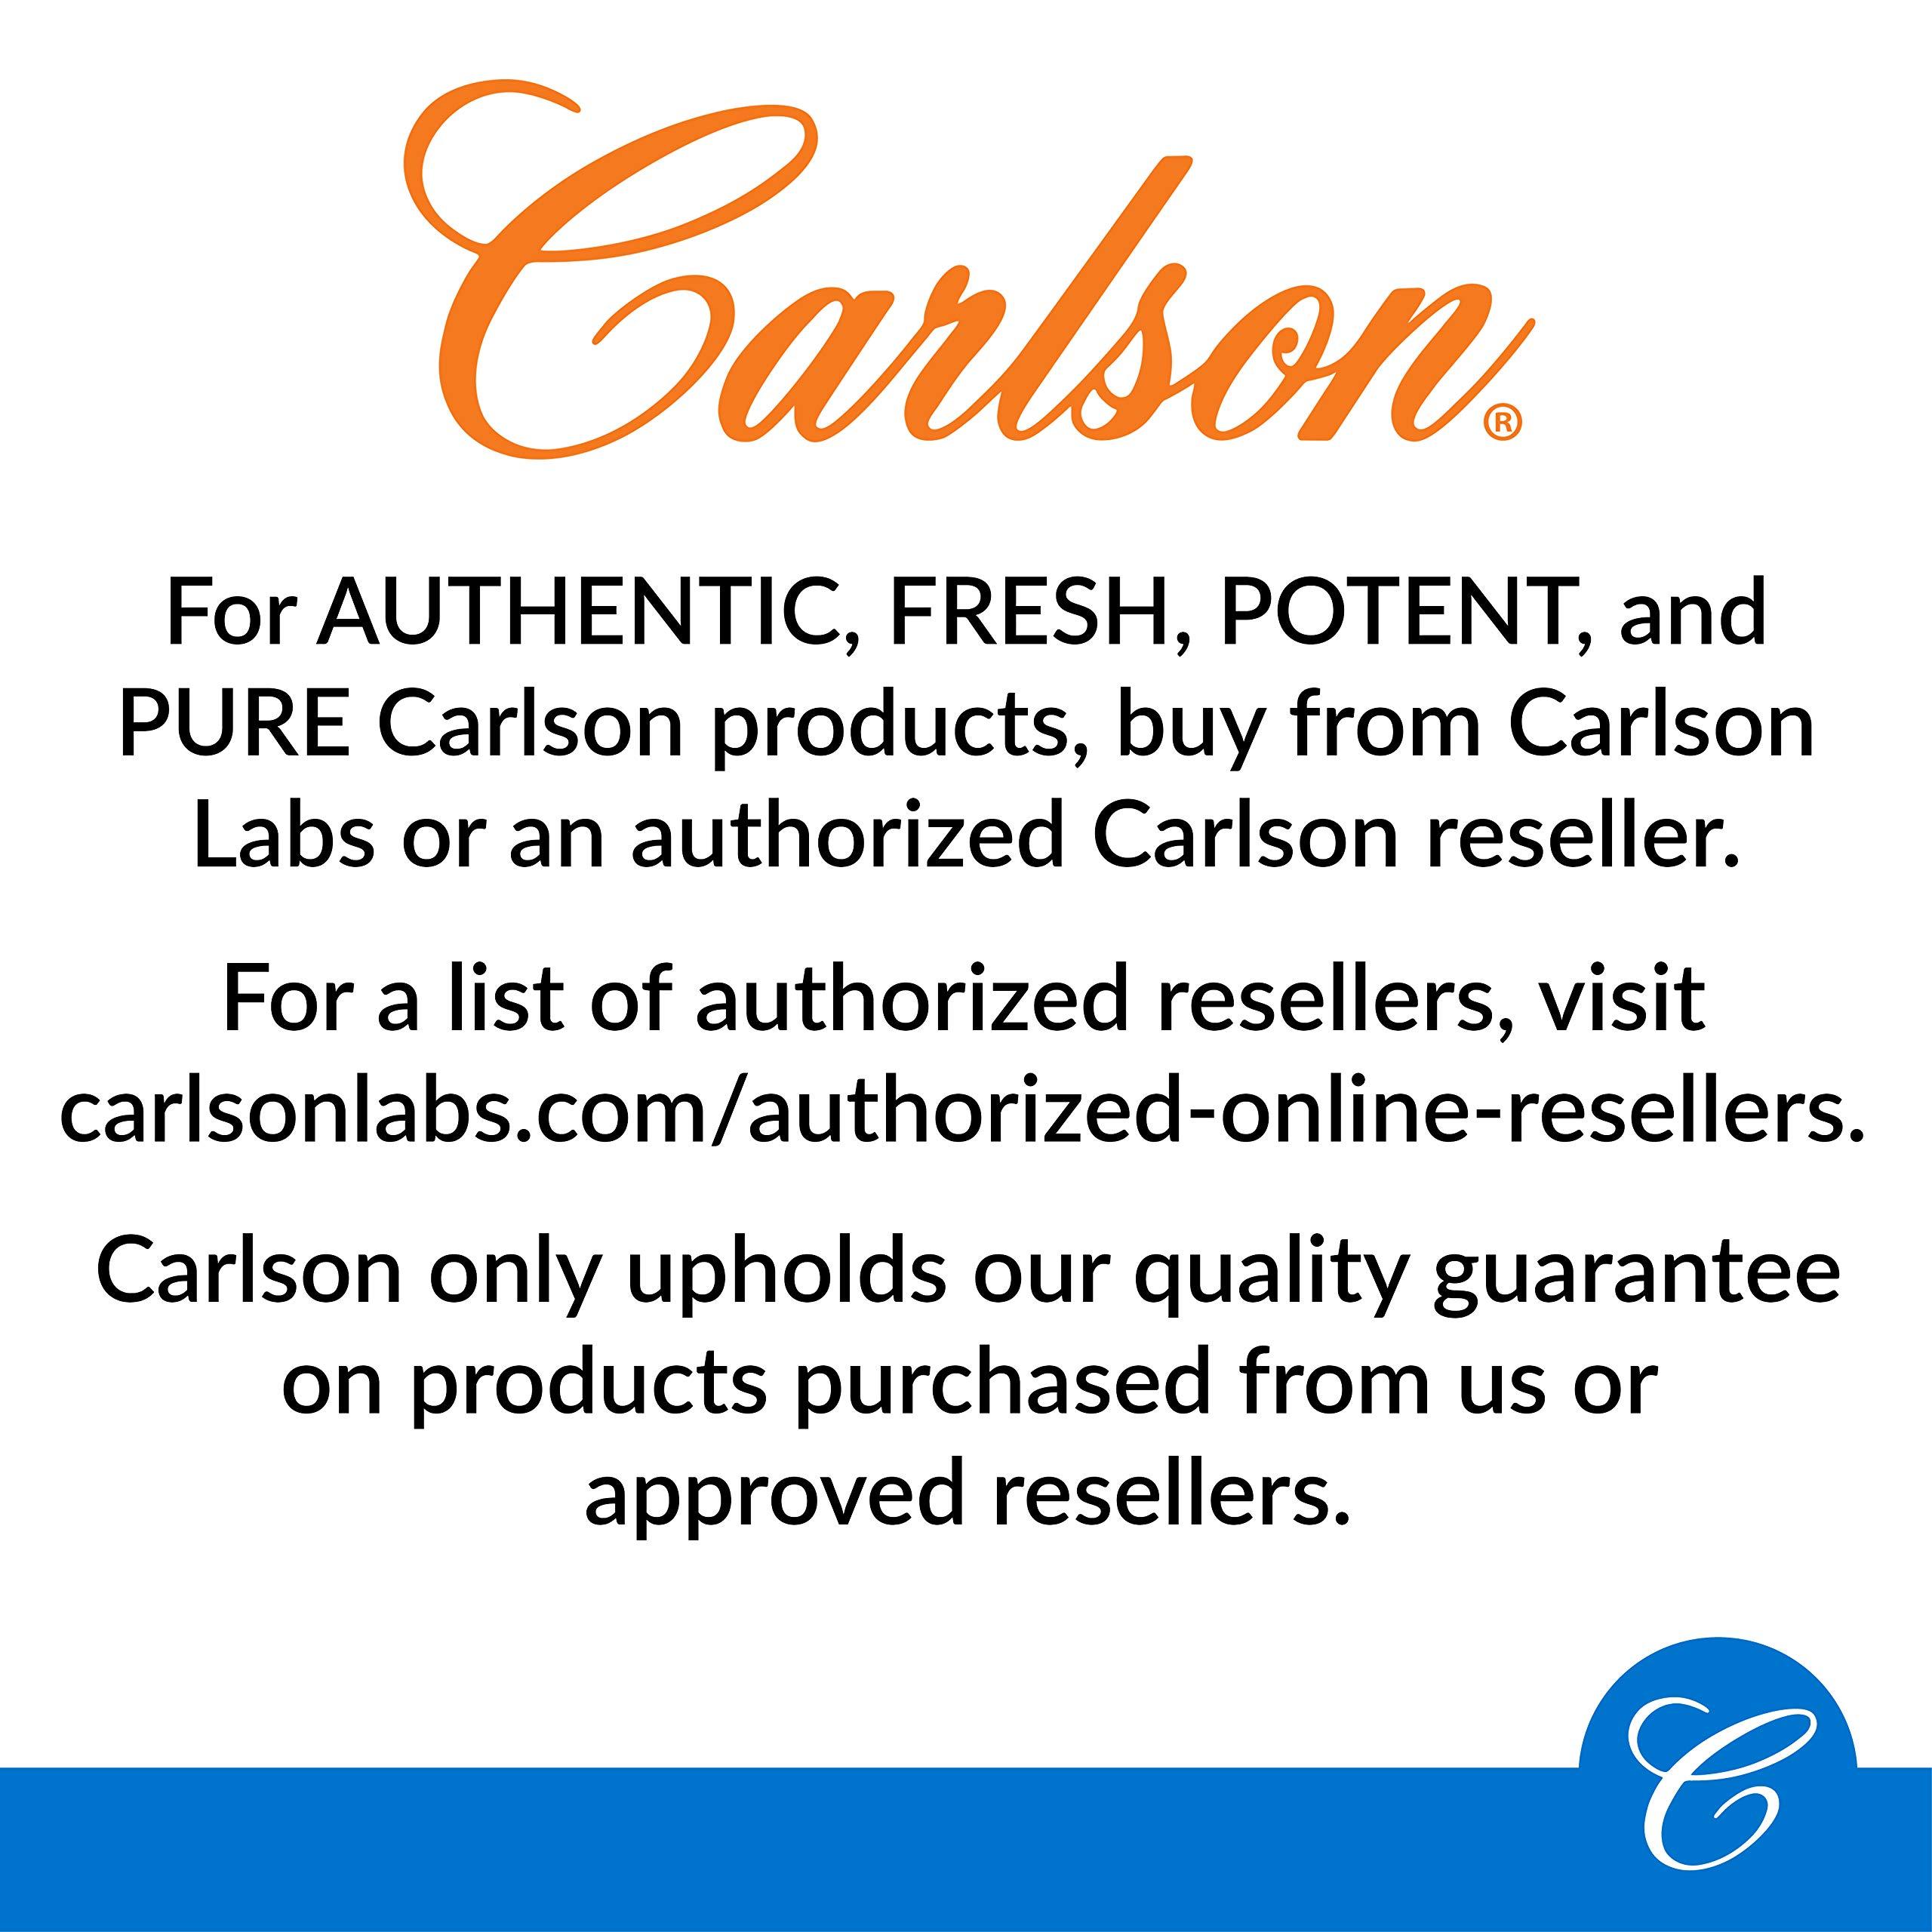 Carlson - Vitamin K2 MK-7 (Menaquinone), 45 mcg, Bone Support, Cardiovascular Function & Calcium Bioavailability, 90 Softgels